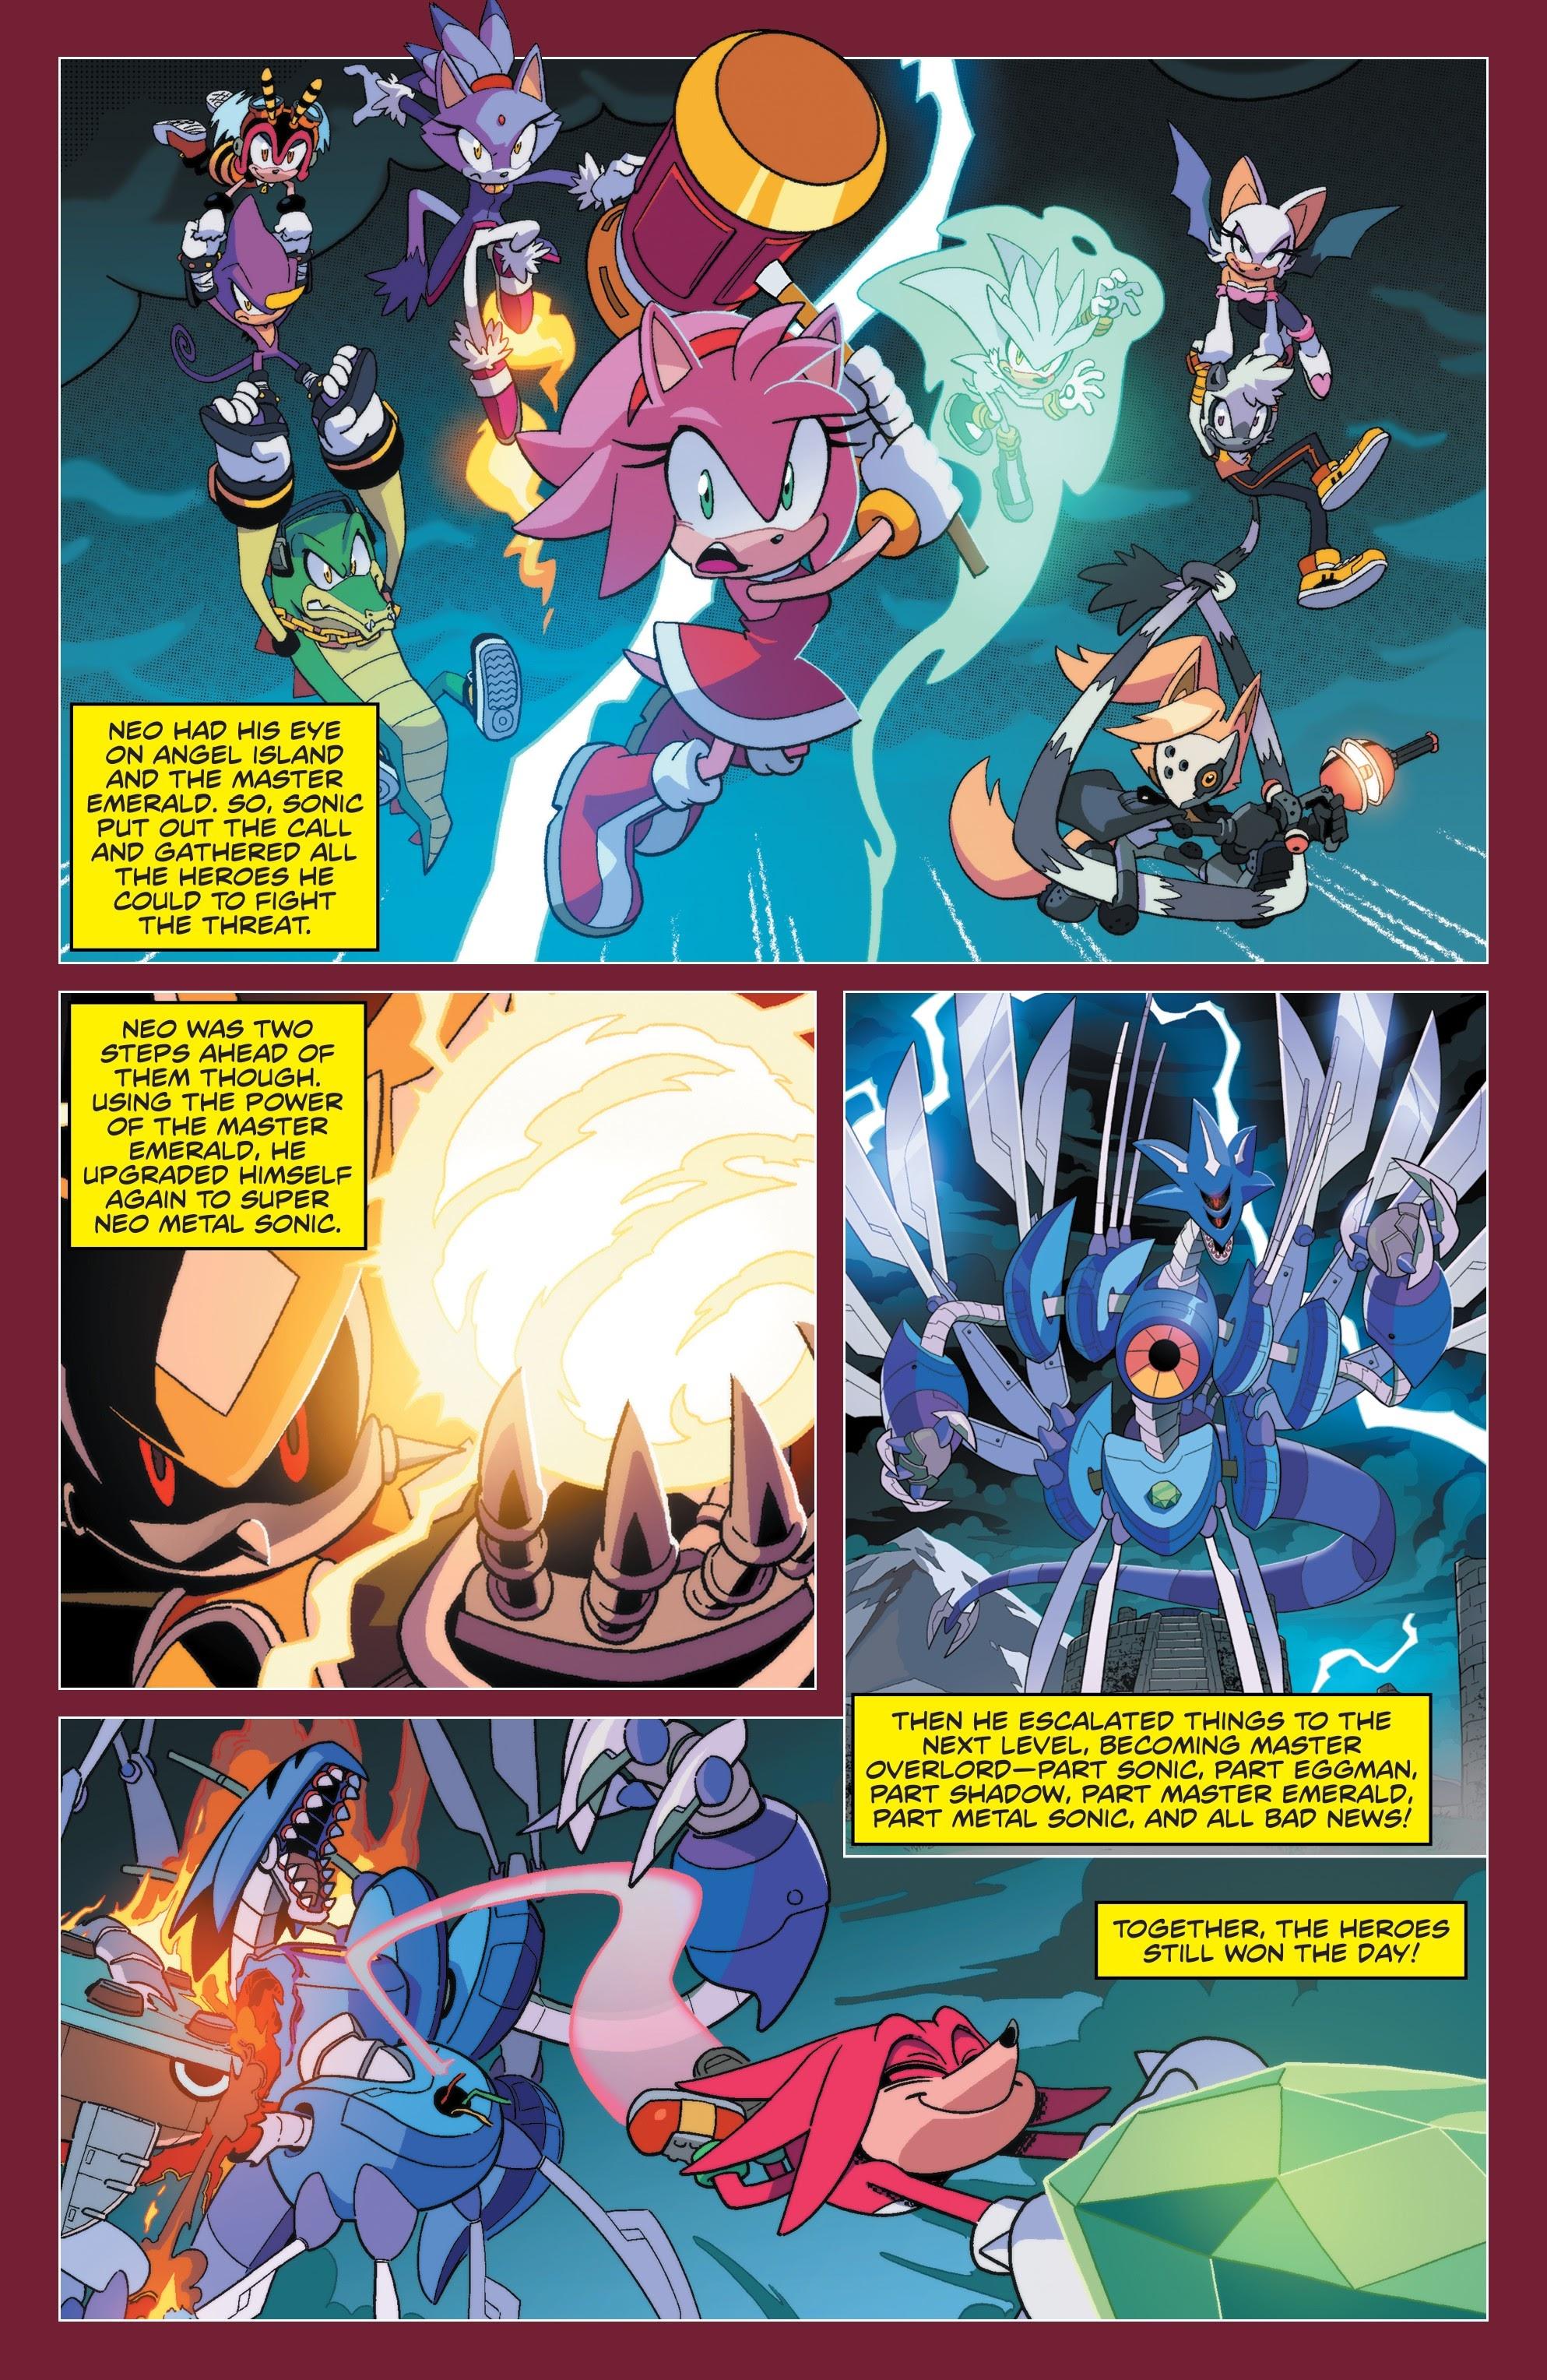 Sonic The Hedgehog Tangle Whisper 0 Read Sonic The Hedgehog Tangle Whisper Issue 0 Page 13